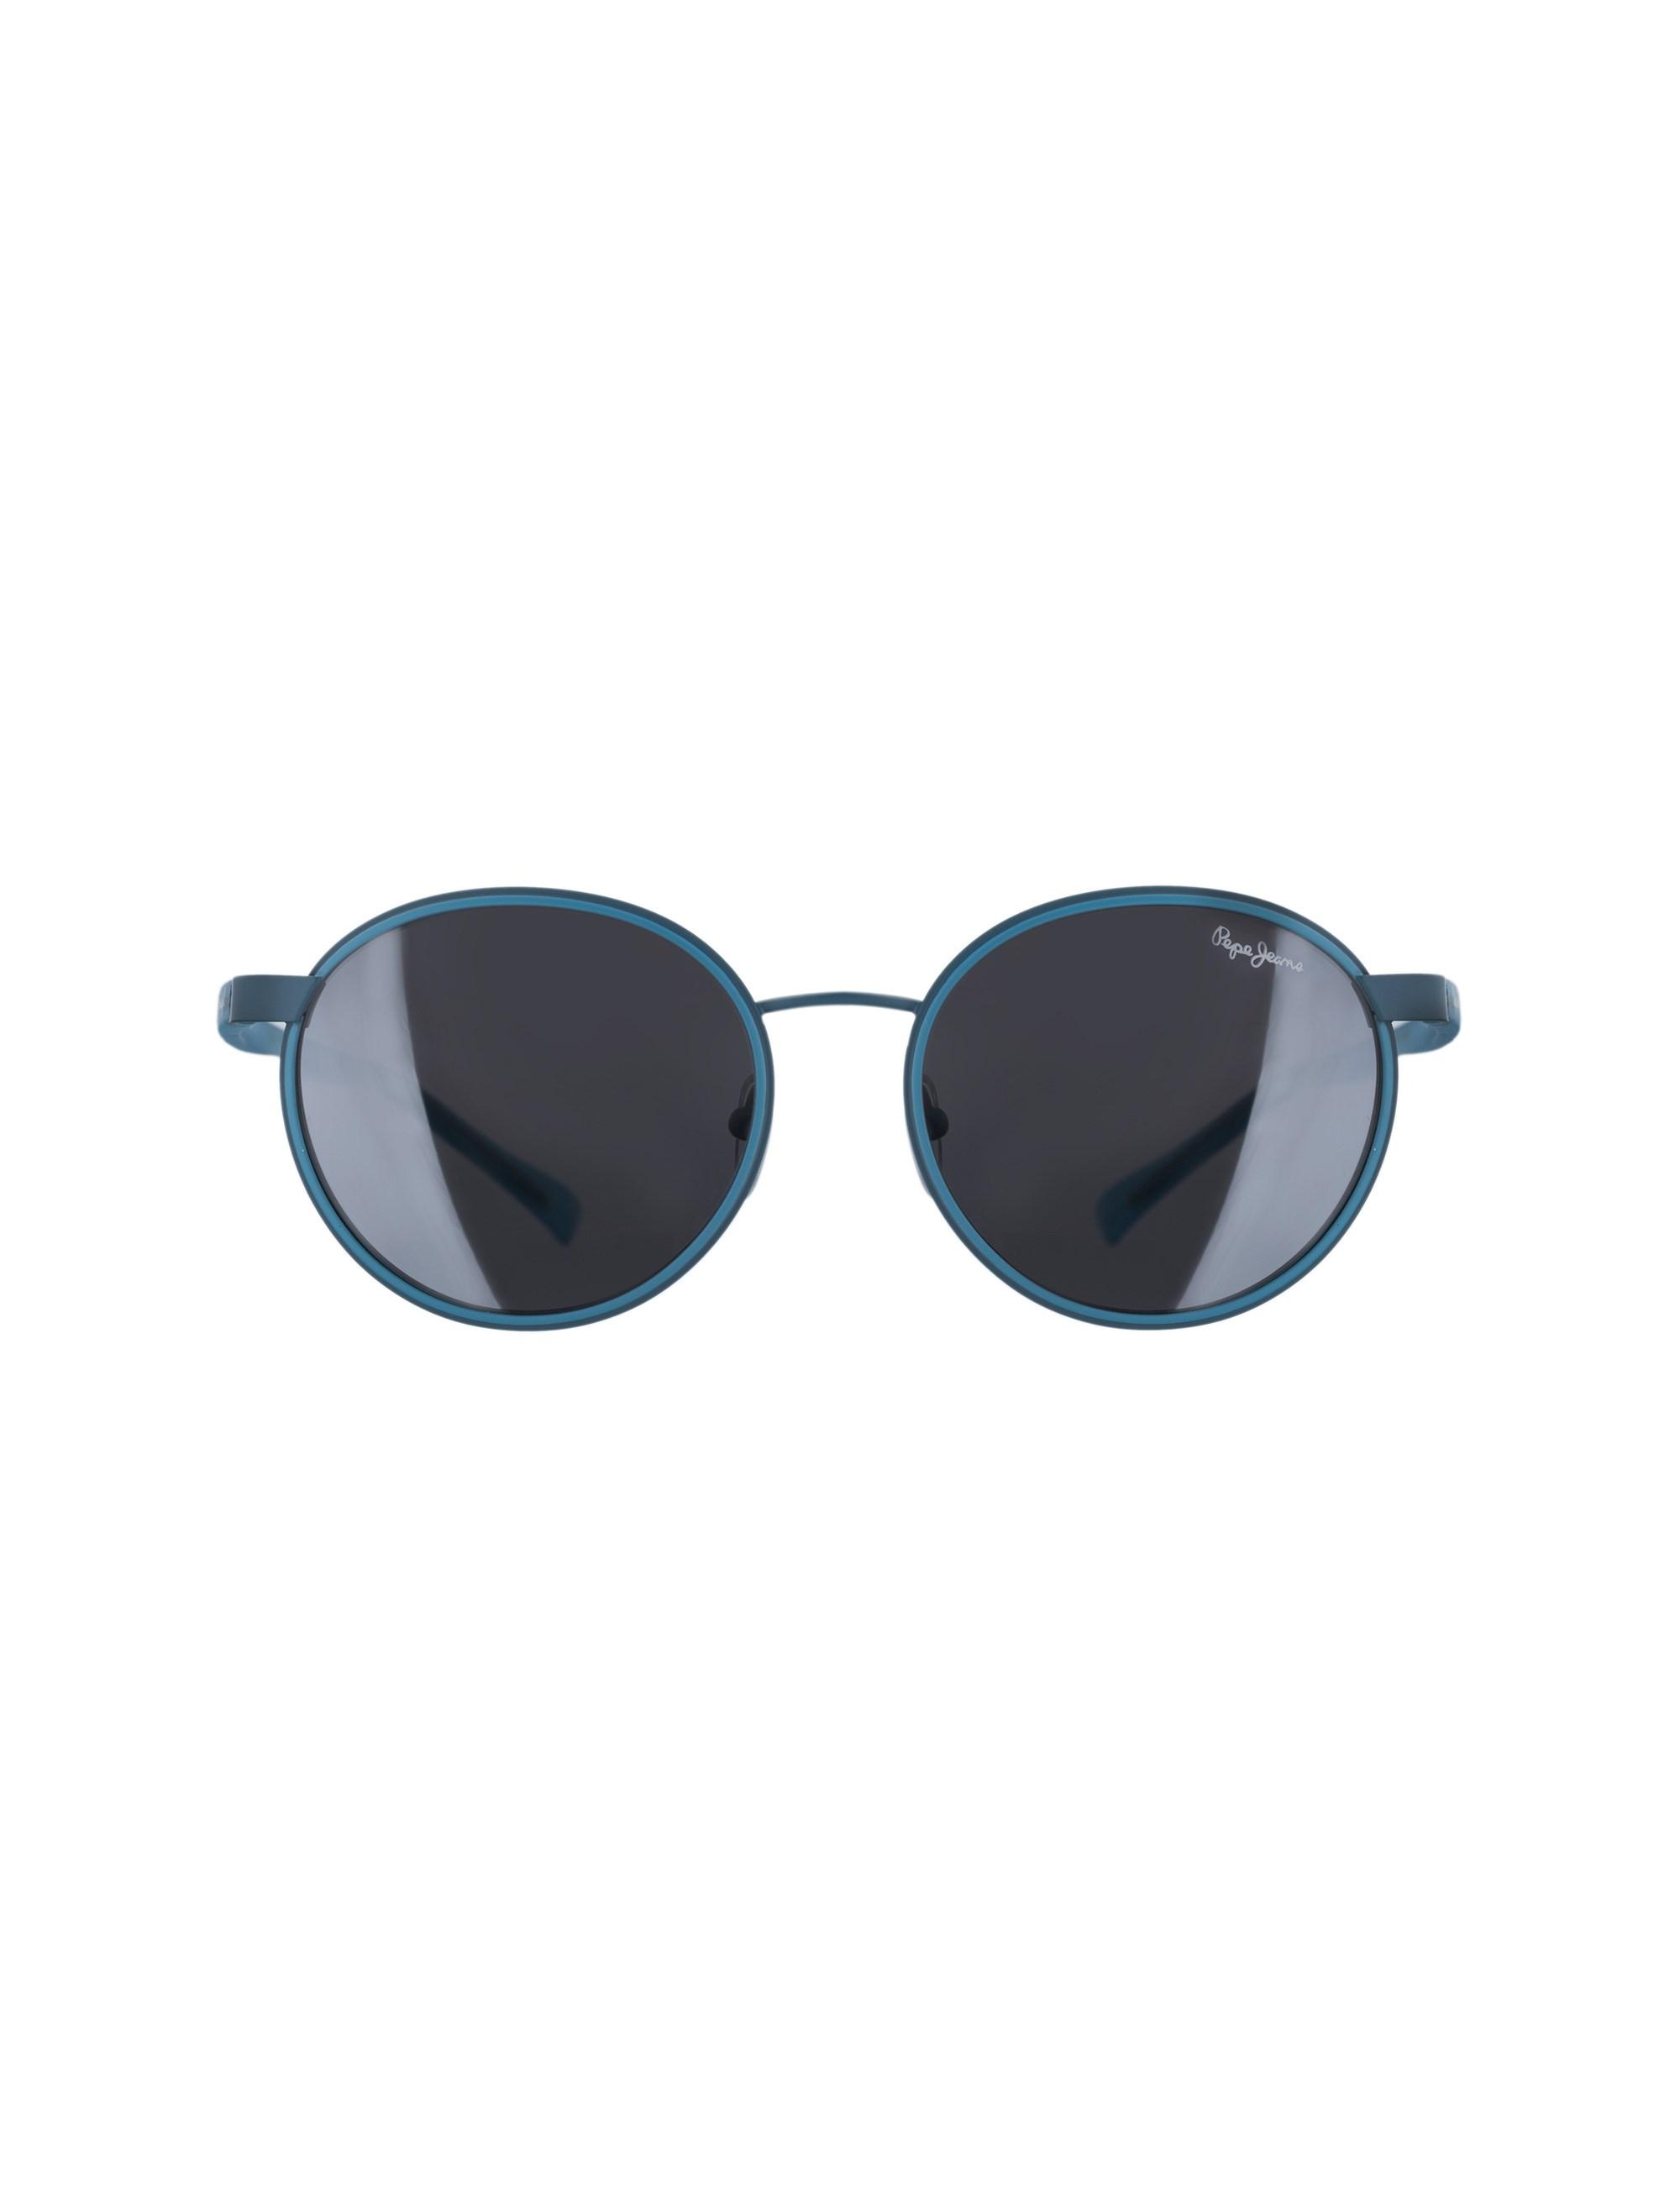 عینک آفتابی گرد زنانه - آبي - 1